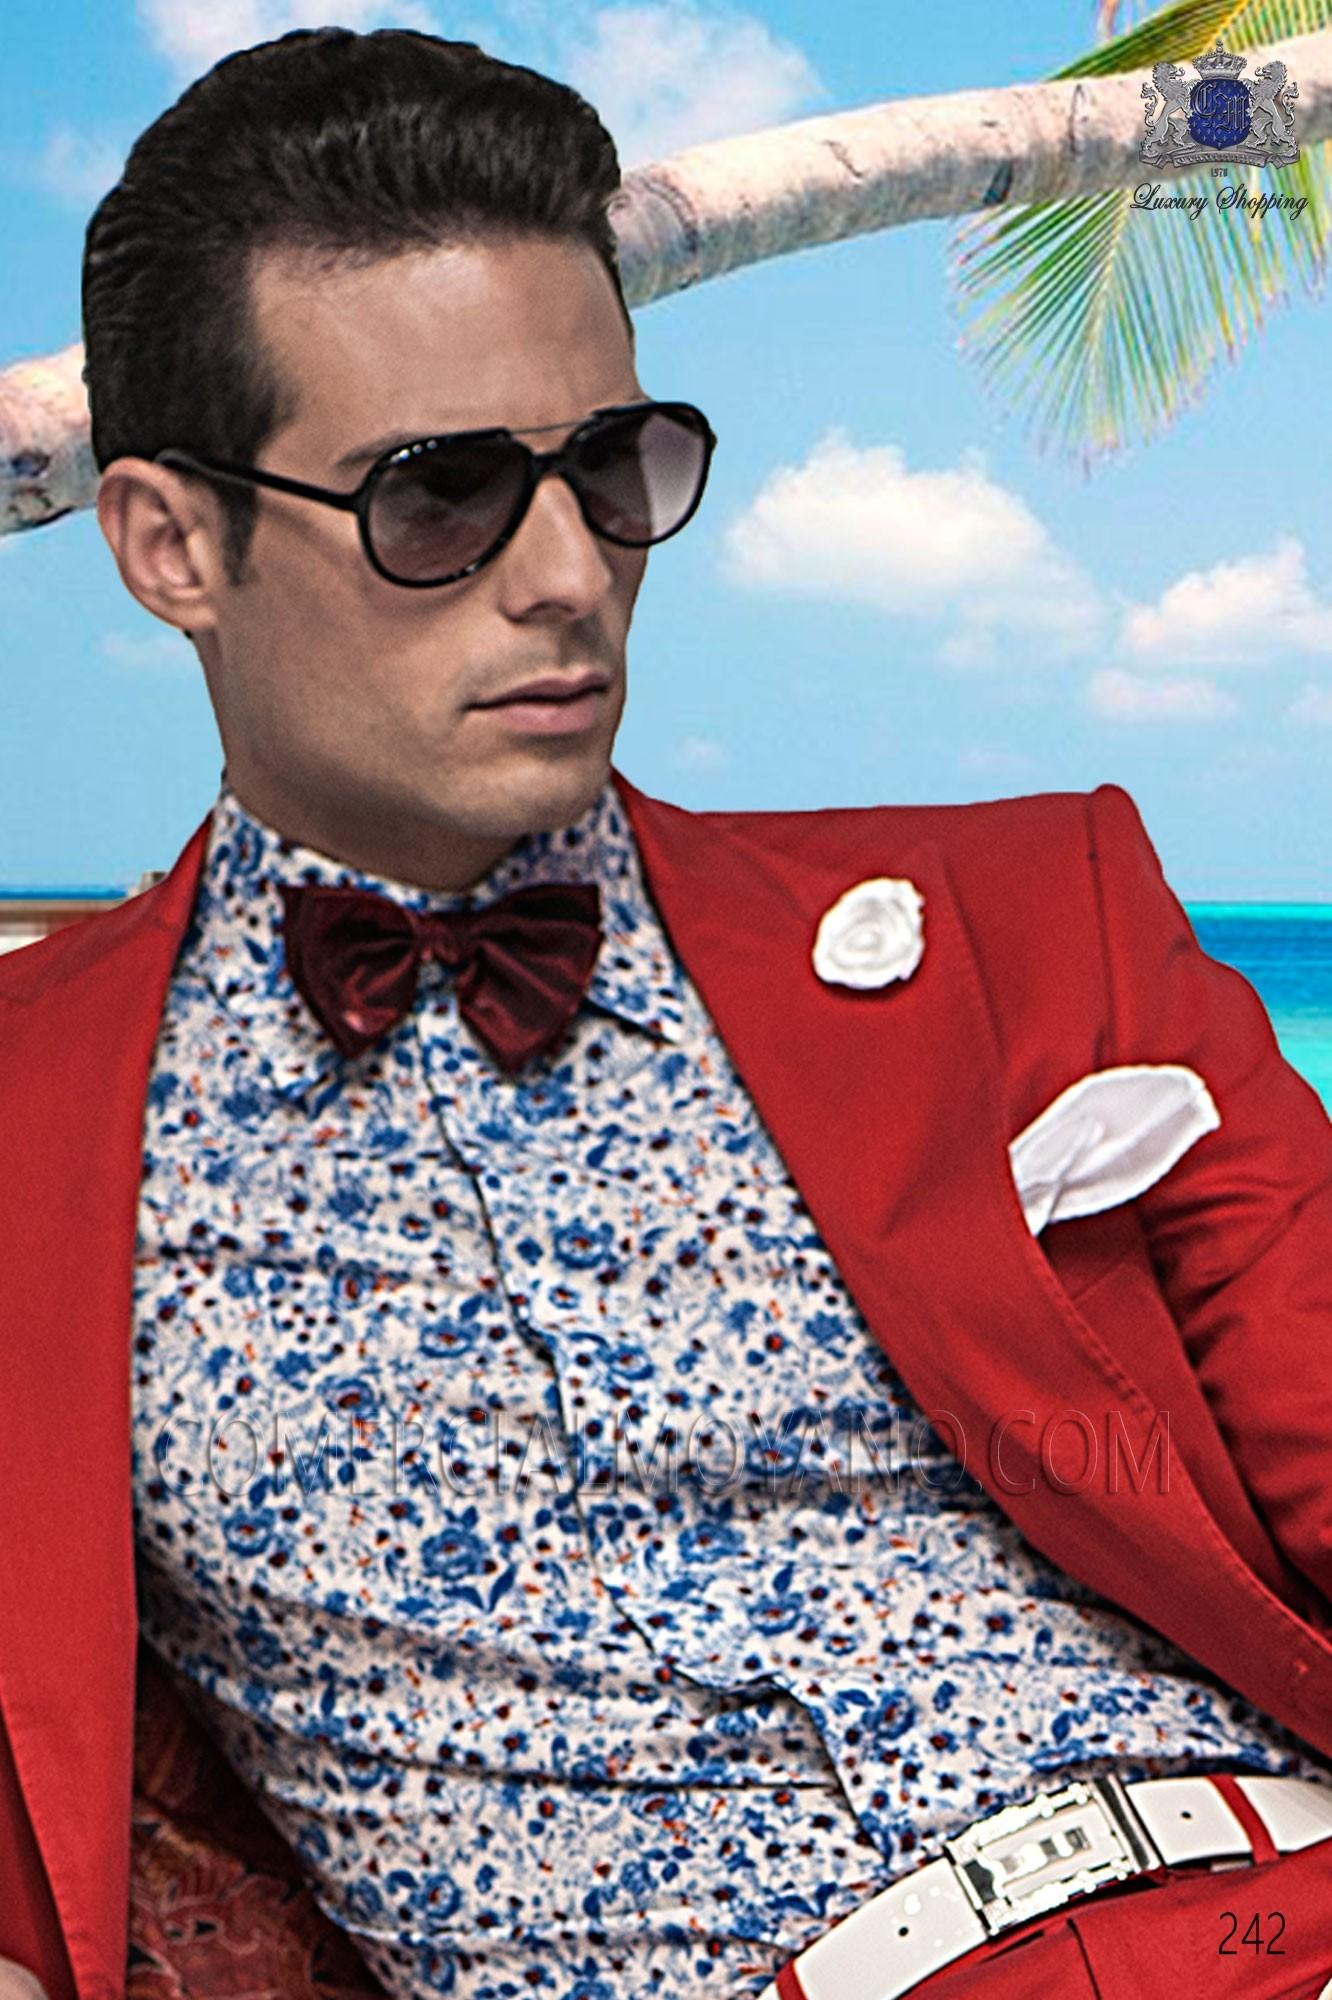 Traje Hipster de novio rojo modelo: 242 Ottavio Nuccio Gala colección Hipster